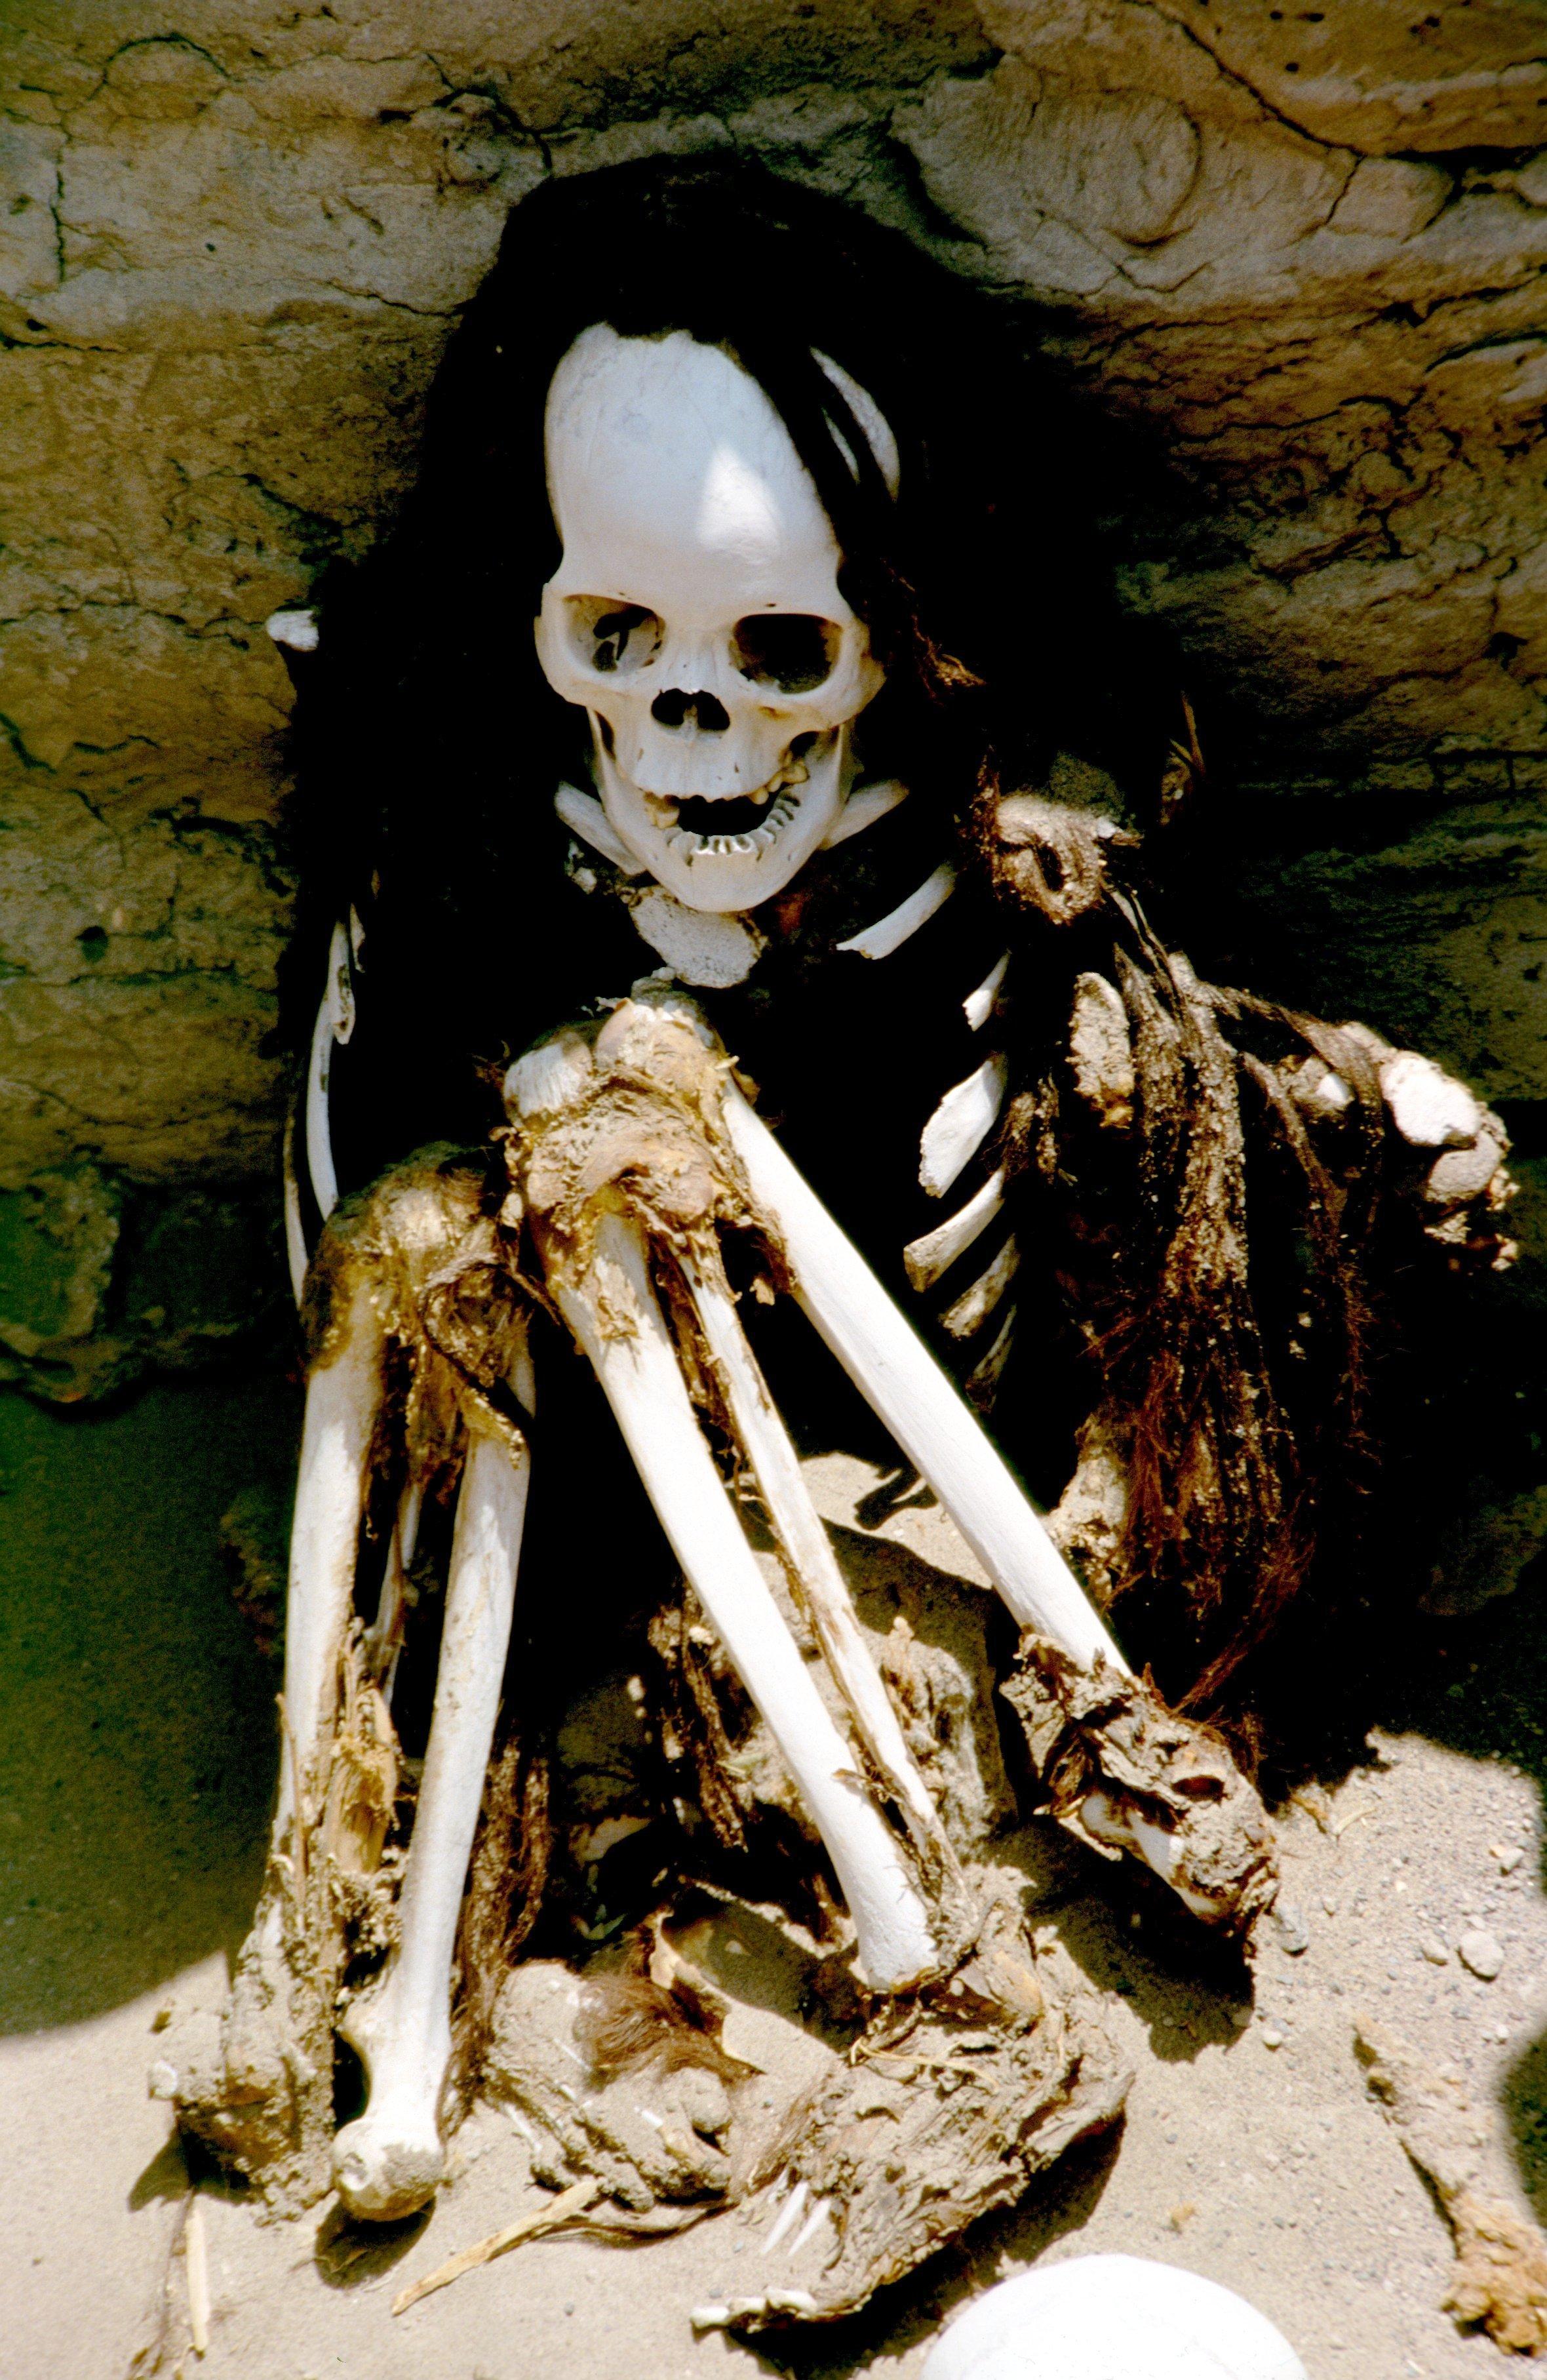 скорченный скелет чаучильи